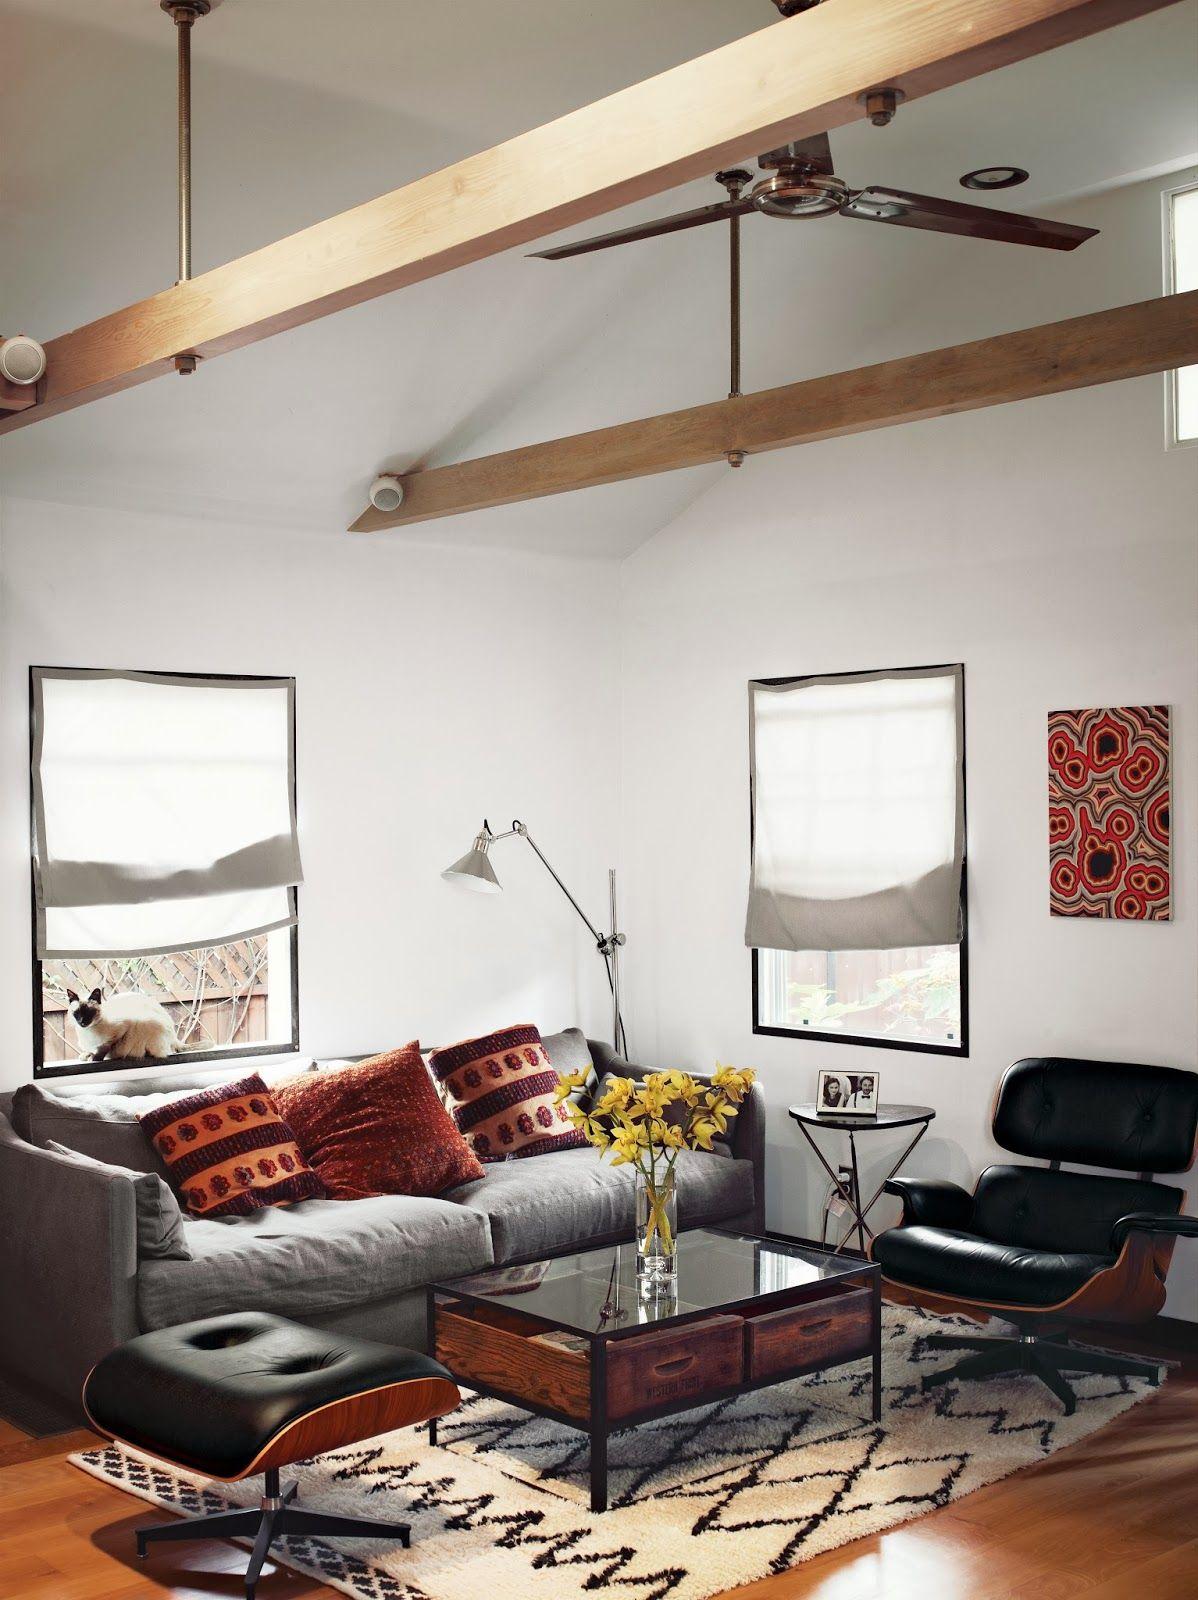 Tyylikäs koti - A Stylish Home Antique Shops & Designers Kuvat: Jack Thompson Pieni koti Hollywoodissa ...